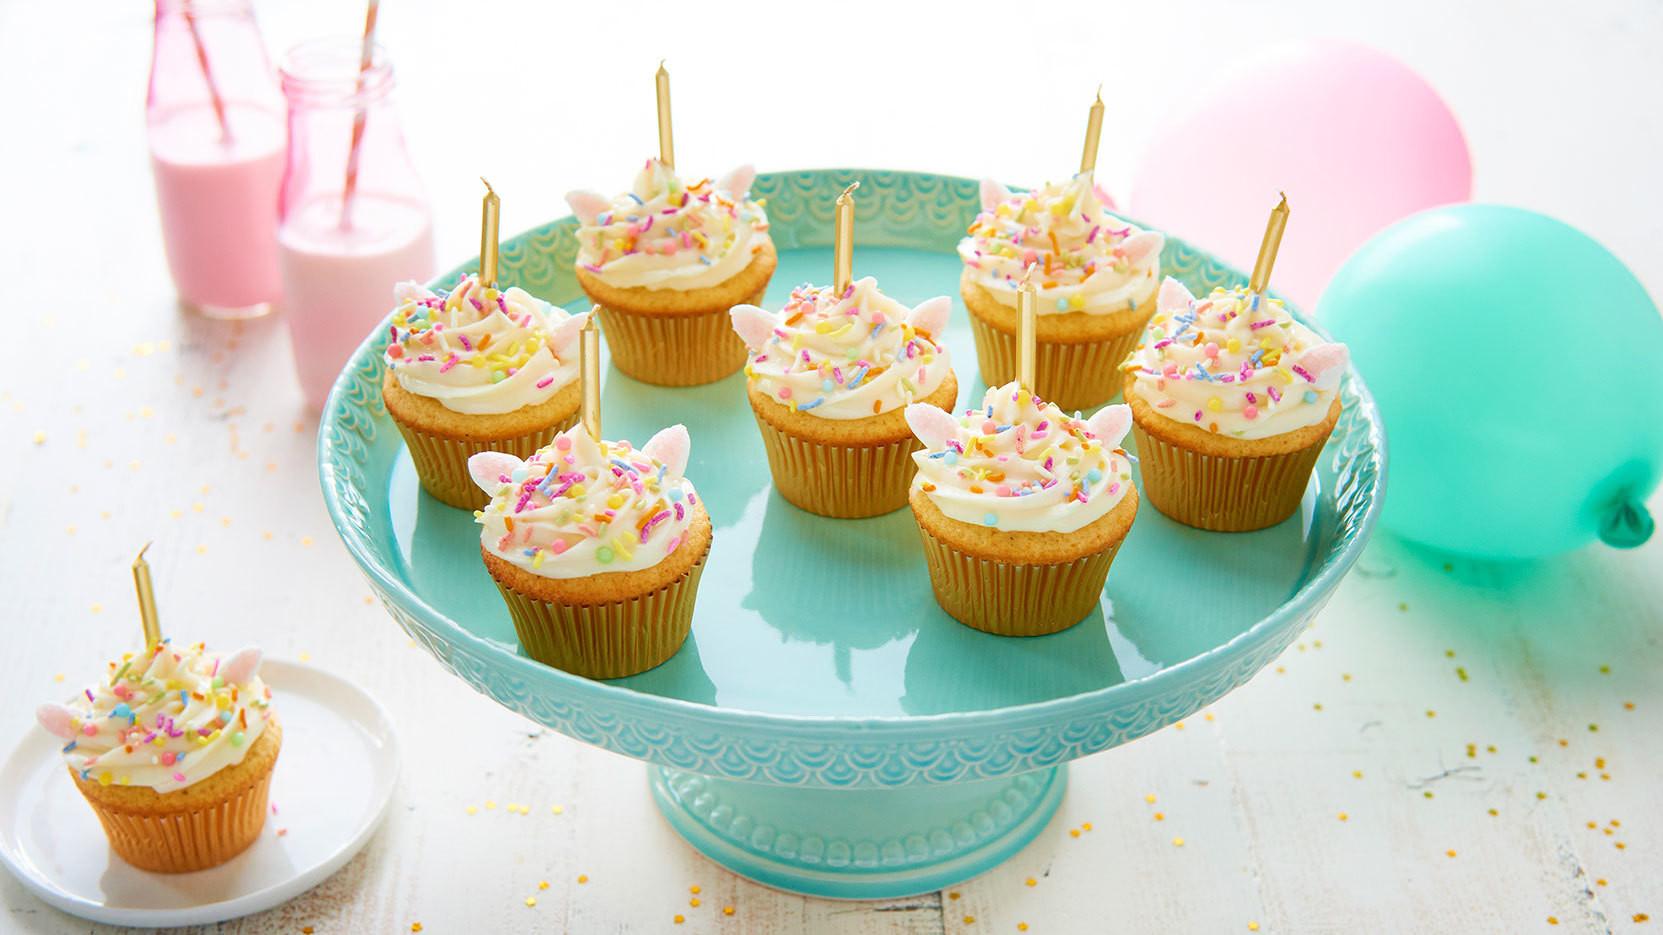 Unicorn Party Theme Food Ideas  Magical Unicorn Birthday Party Ideas for Kids EatingWell